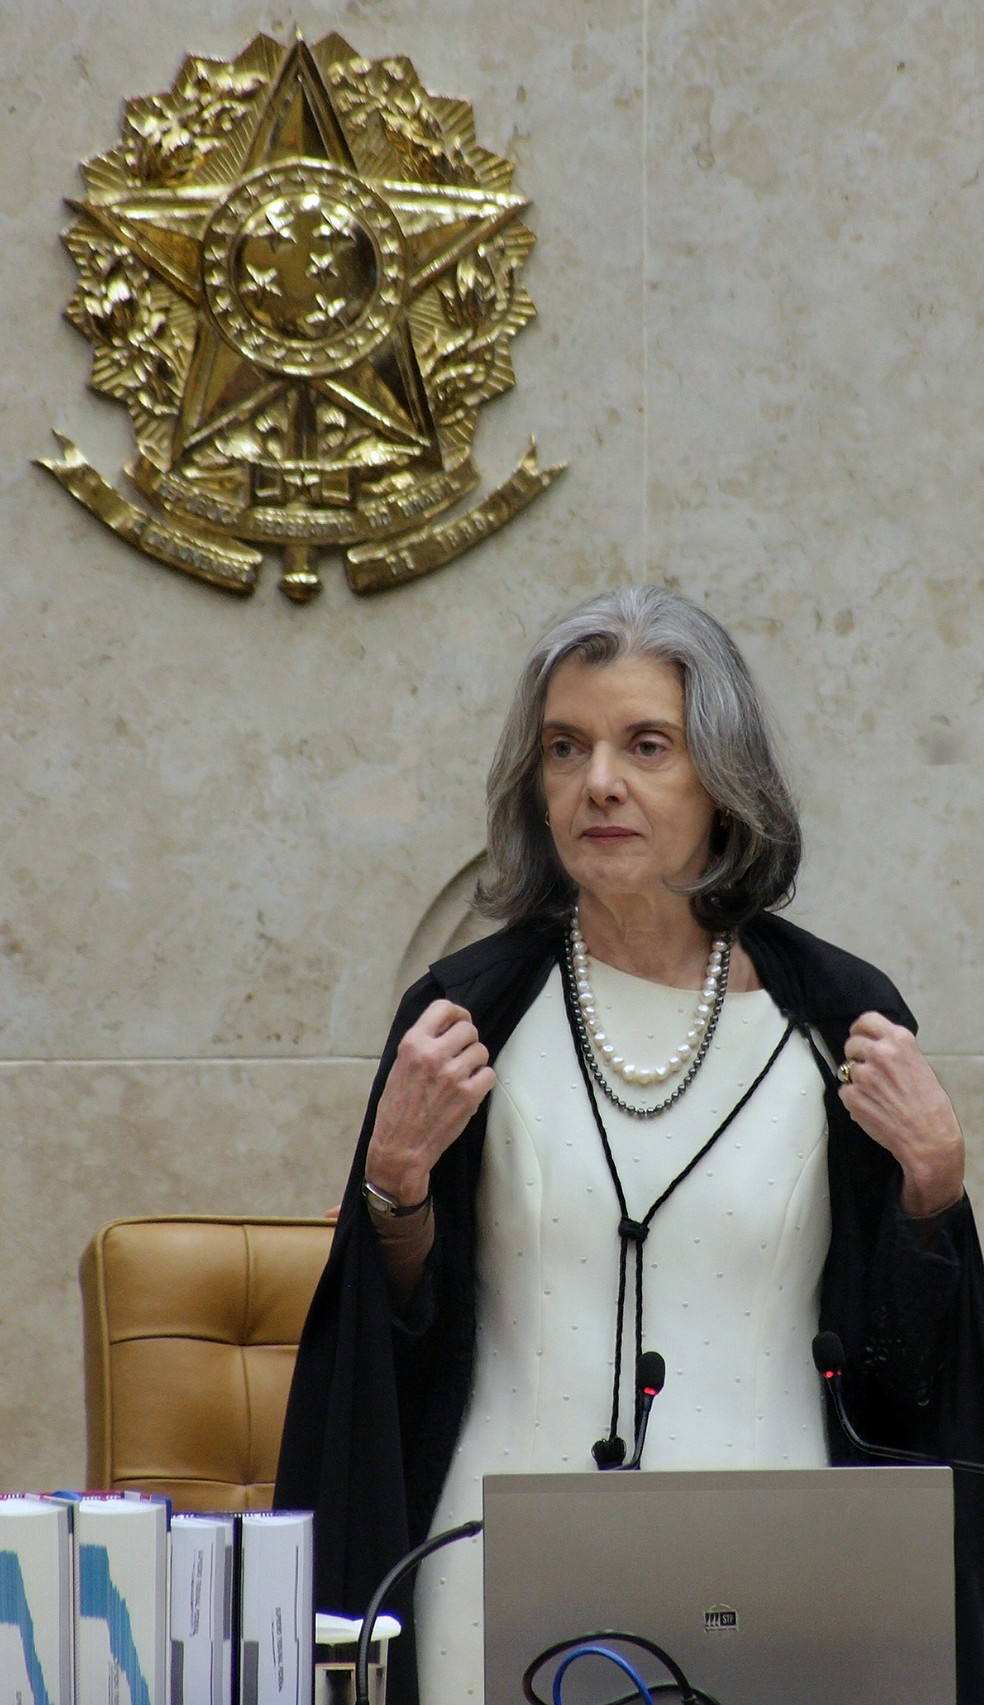 Cármen Lúcia desempatou o julgamento ao votar a favor do modelo